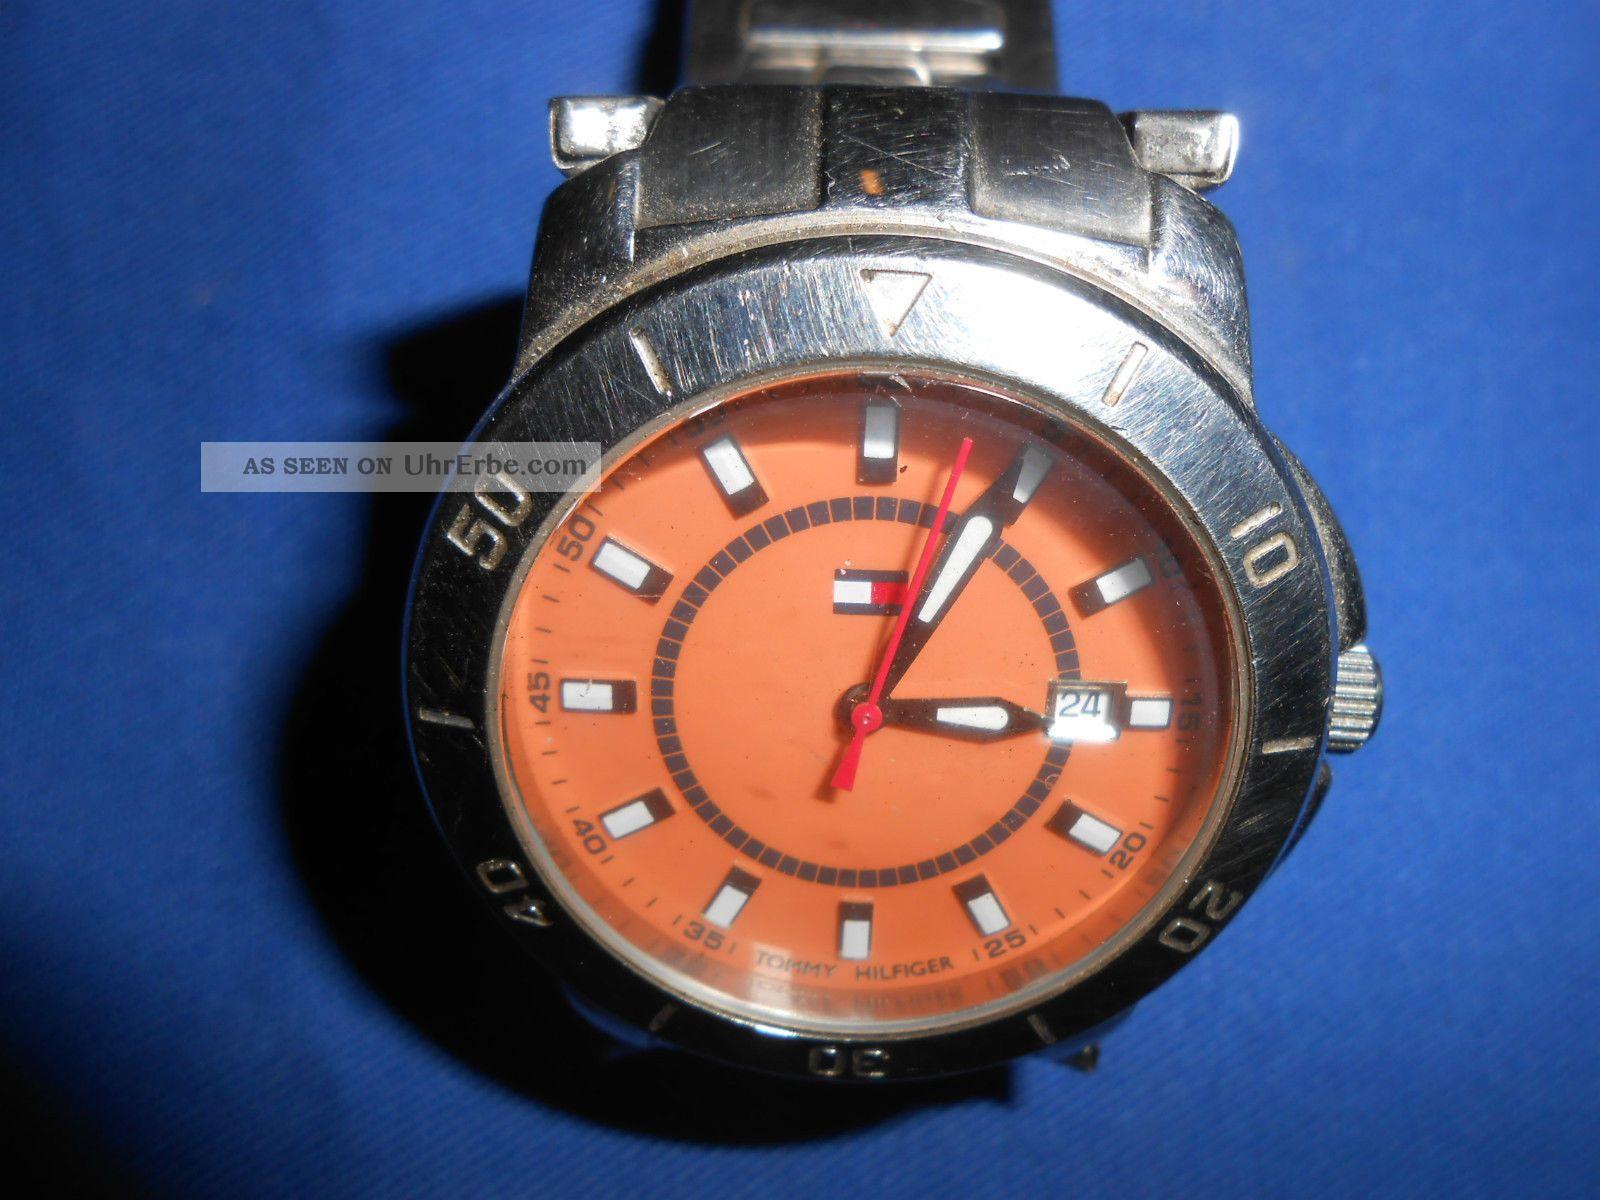 Herrenuhr Tommy Hilfinger Armbanduhr Ersatzteile Uhren Männeruhr Herren Uhr Armbanduhren Bild